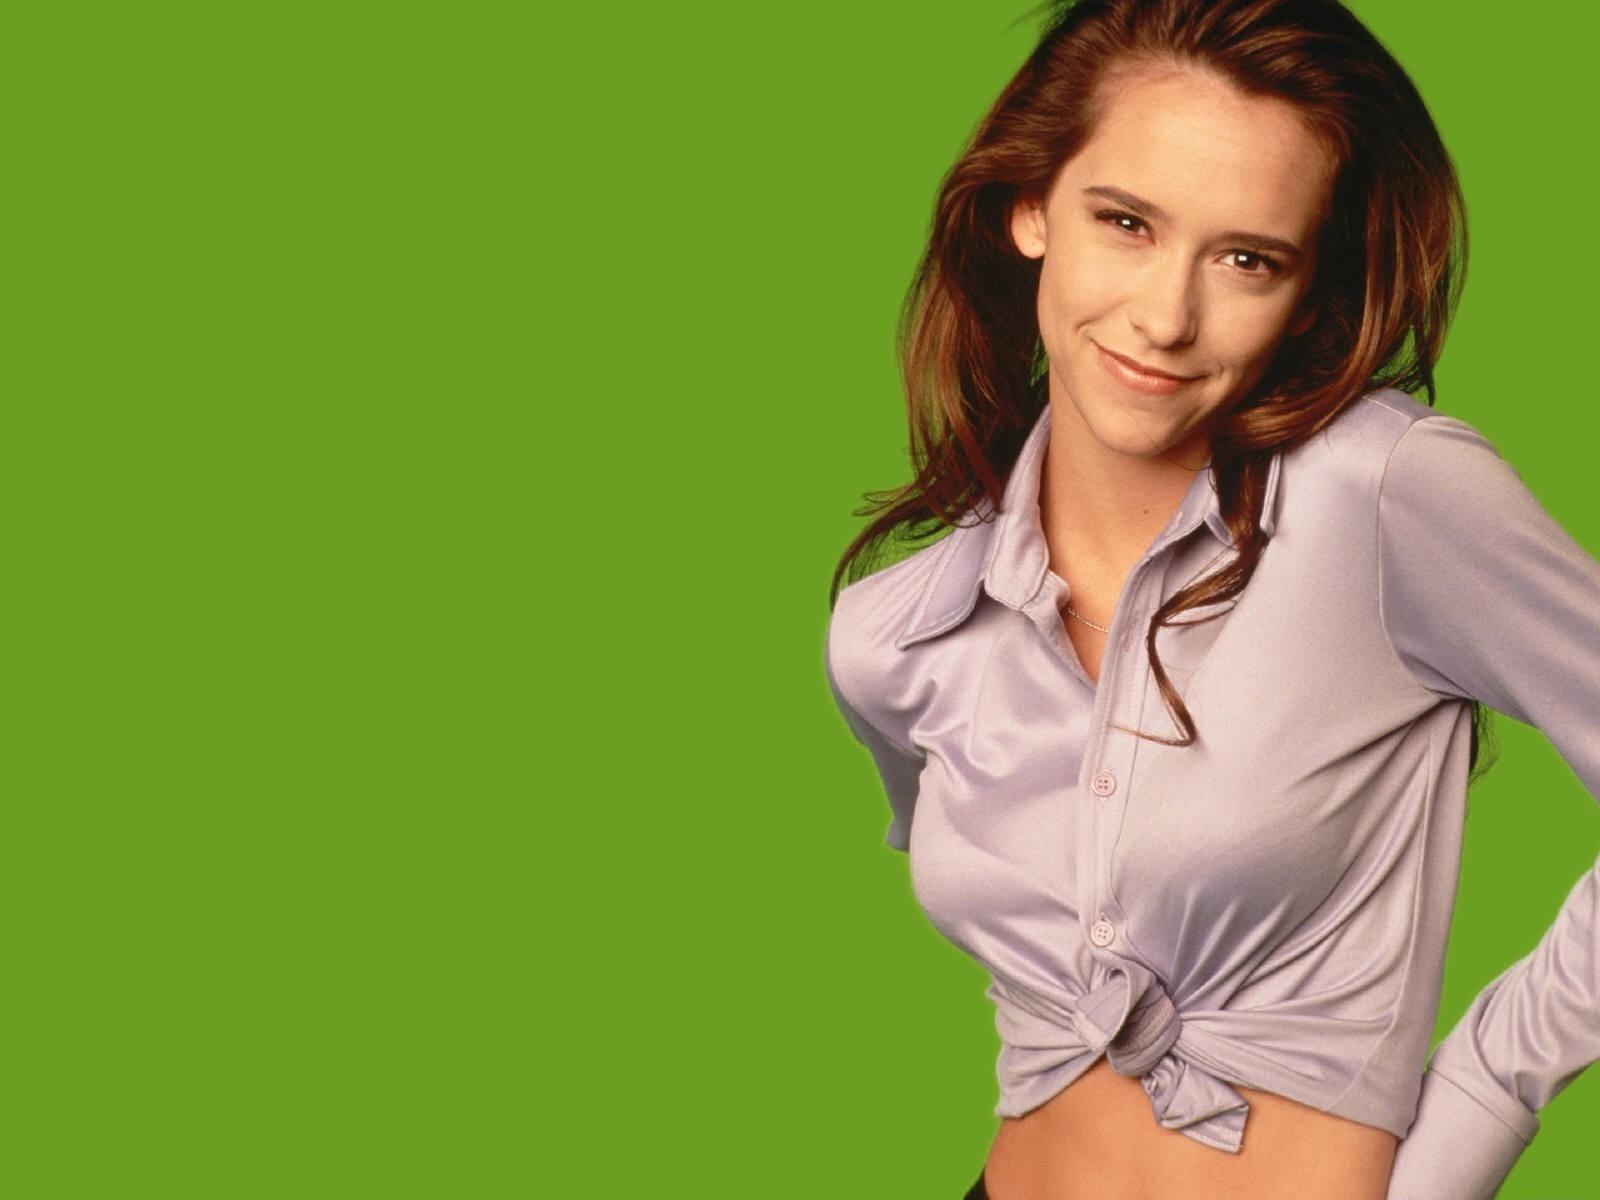 Wallpaper di Jennifer Love Hewitt su fondo verde